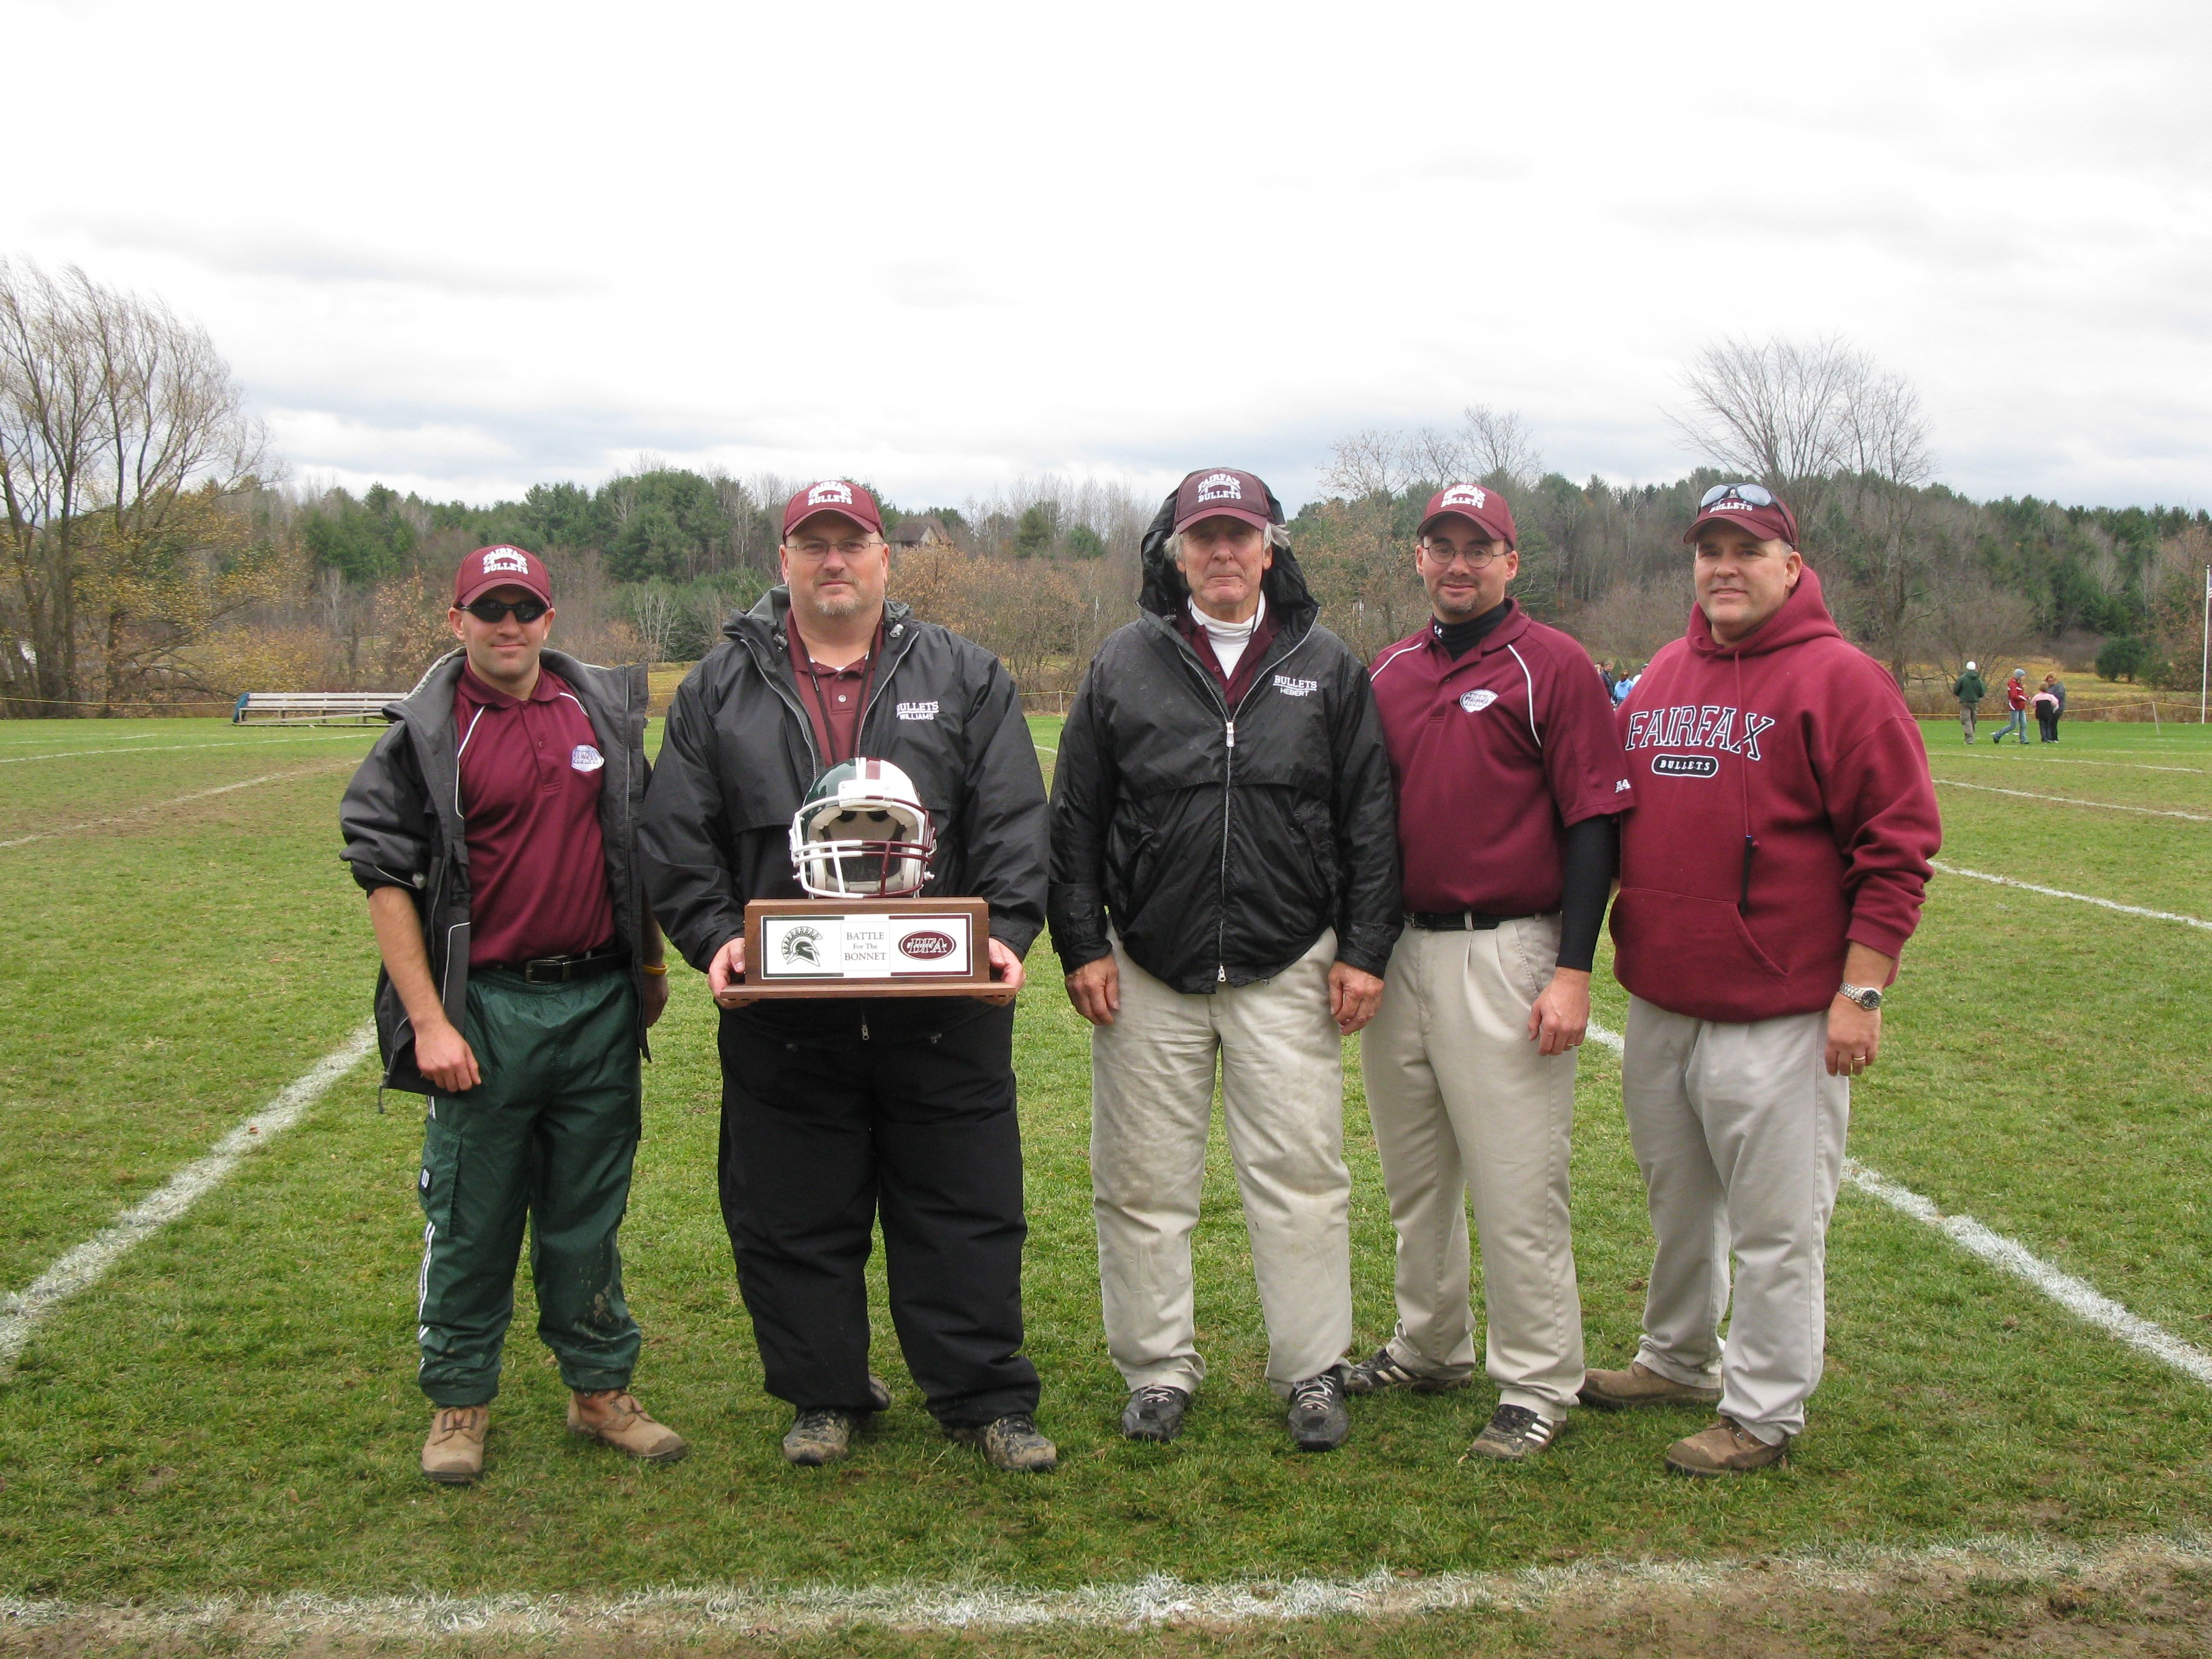 Left to right  Coach Laroche, Coach Williams, Coach Hebert, Coach Redding, Coach Campbell  - IMG 0390